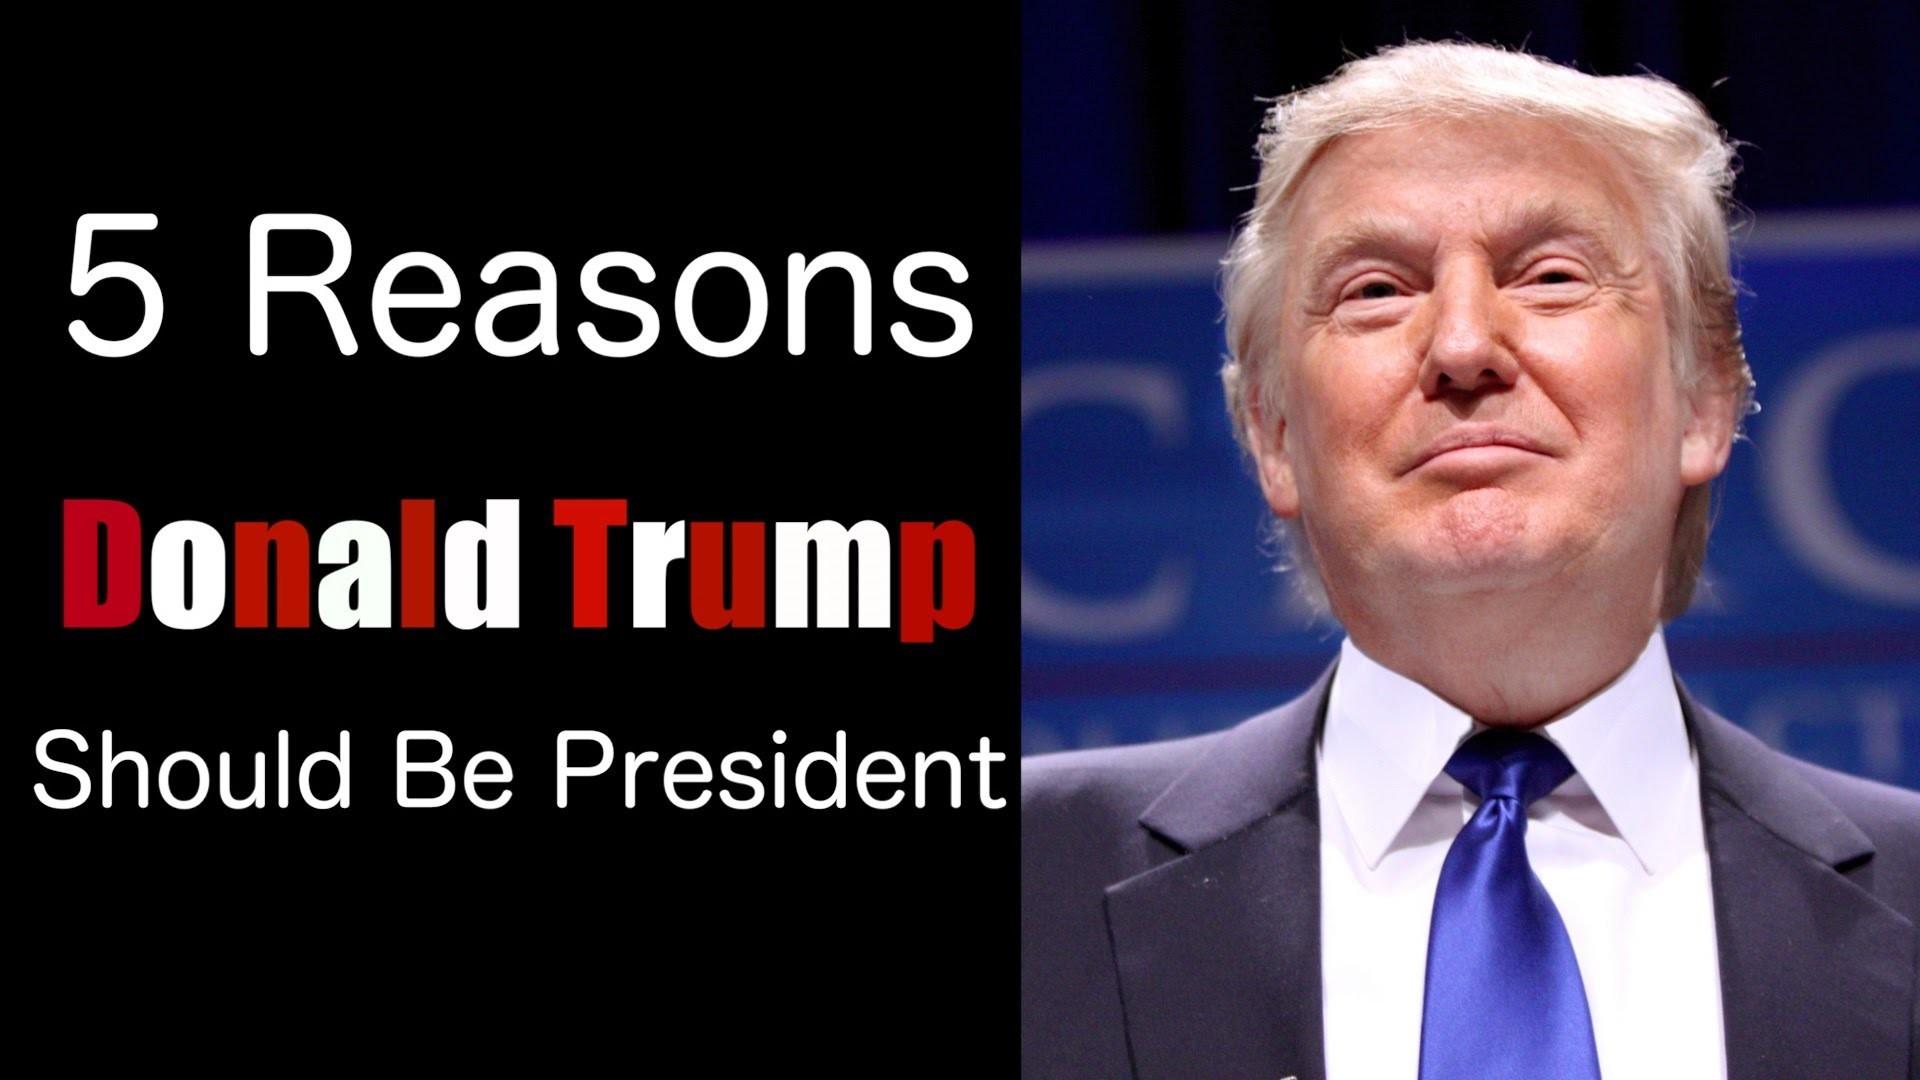 5 Reasons Donald Trump Should Be President